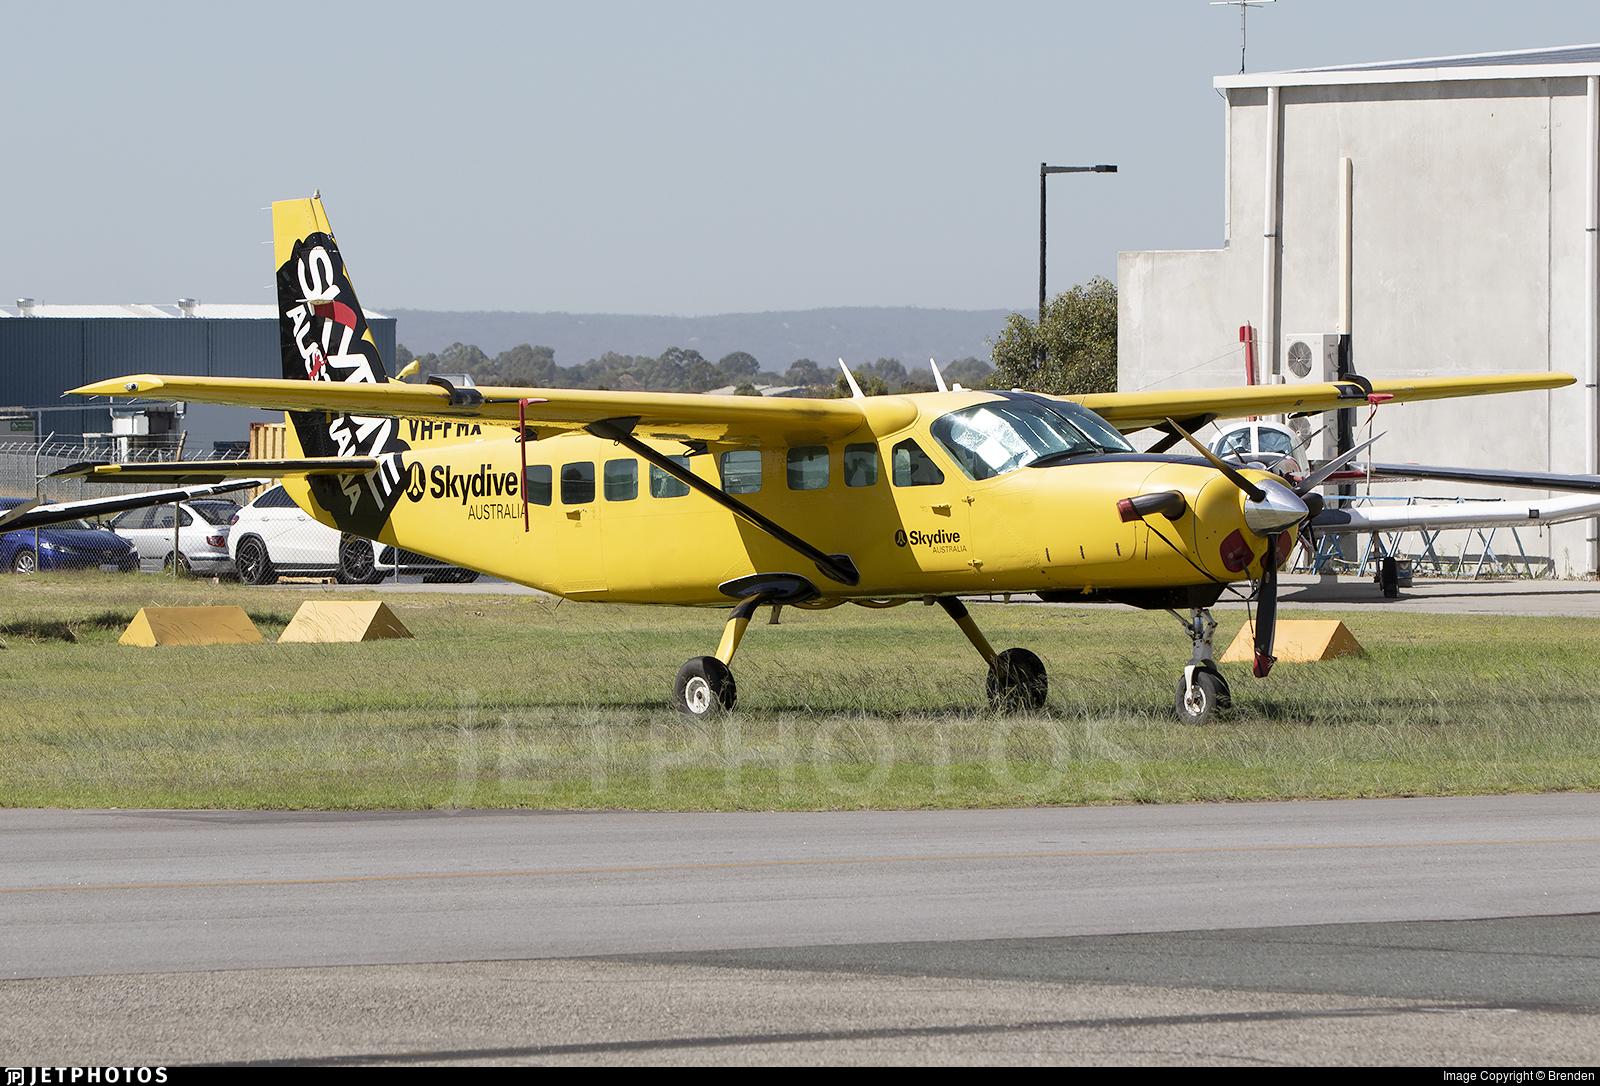 VH-FMX - Cessna 208B Grand Caravan - Skydive Australia